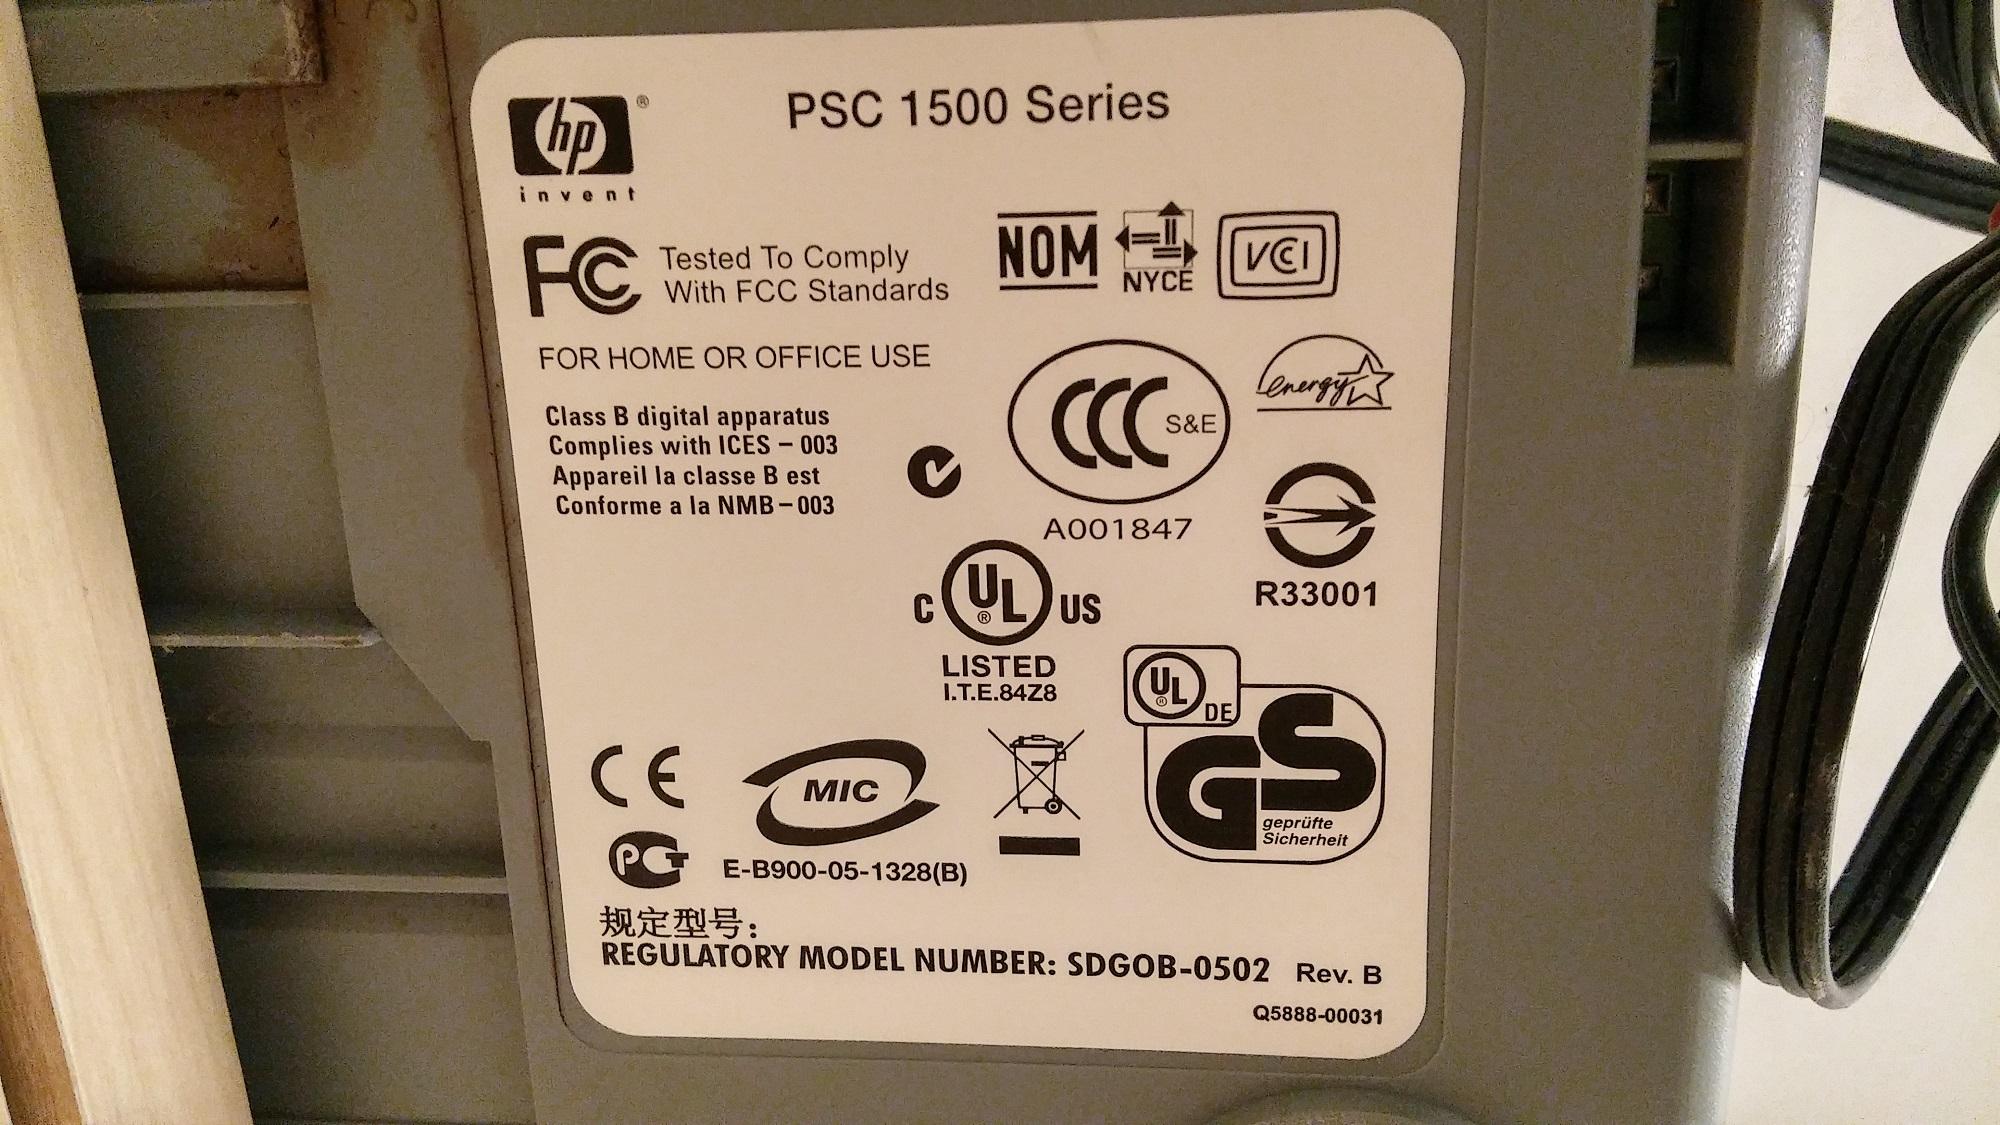 Hp deskjet 1510 all-in-one printer series | hp® customer support.